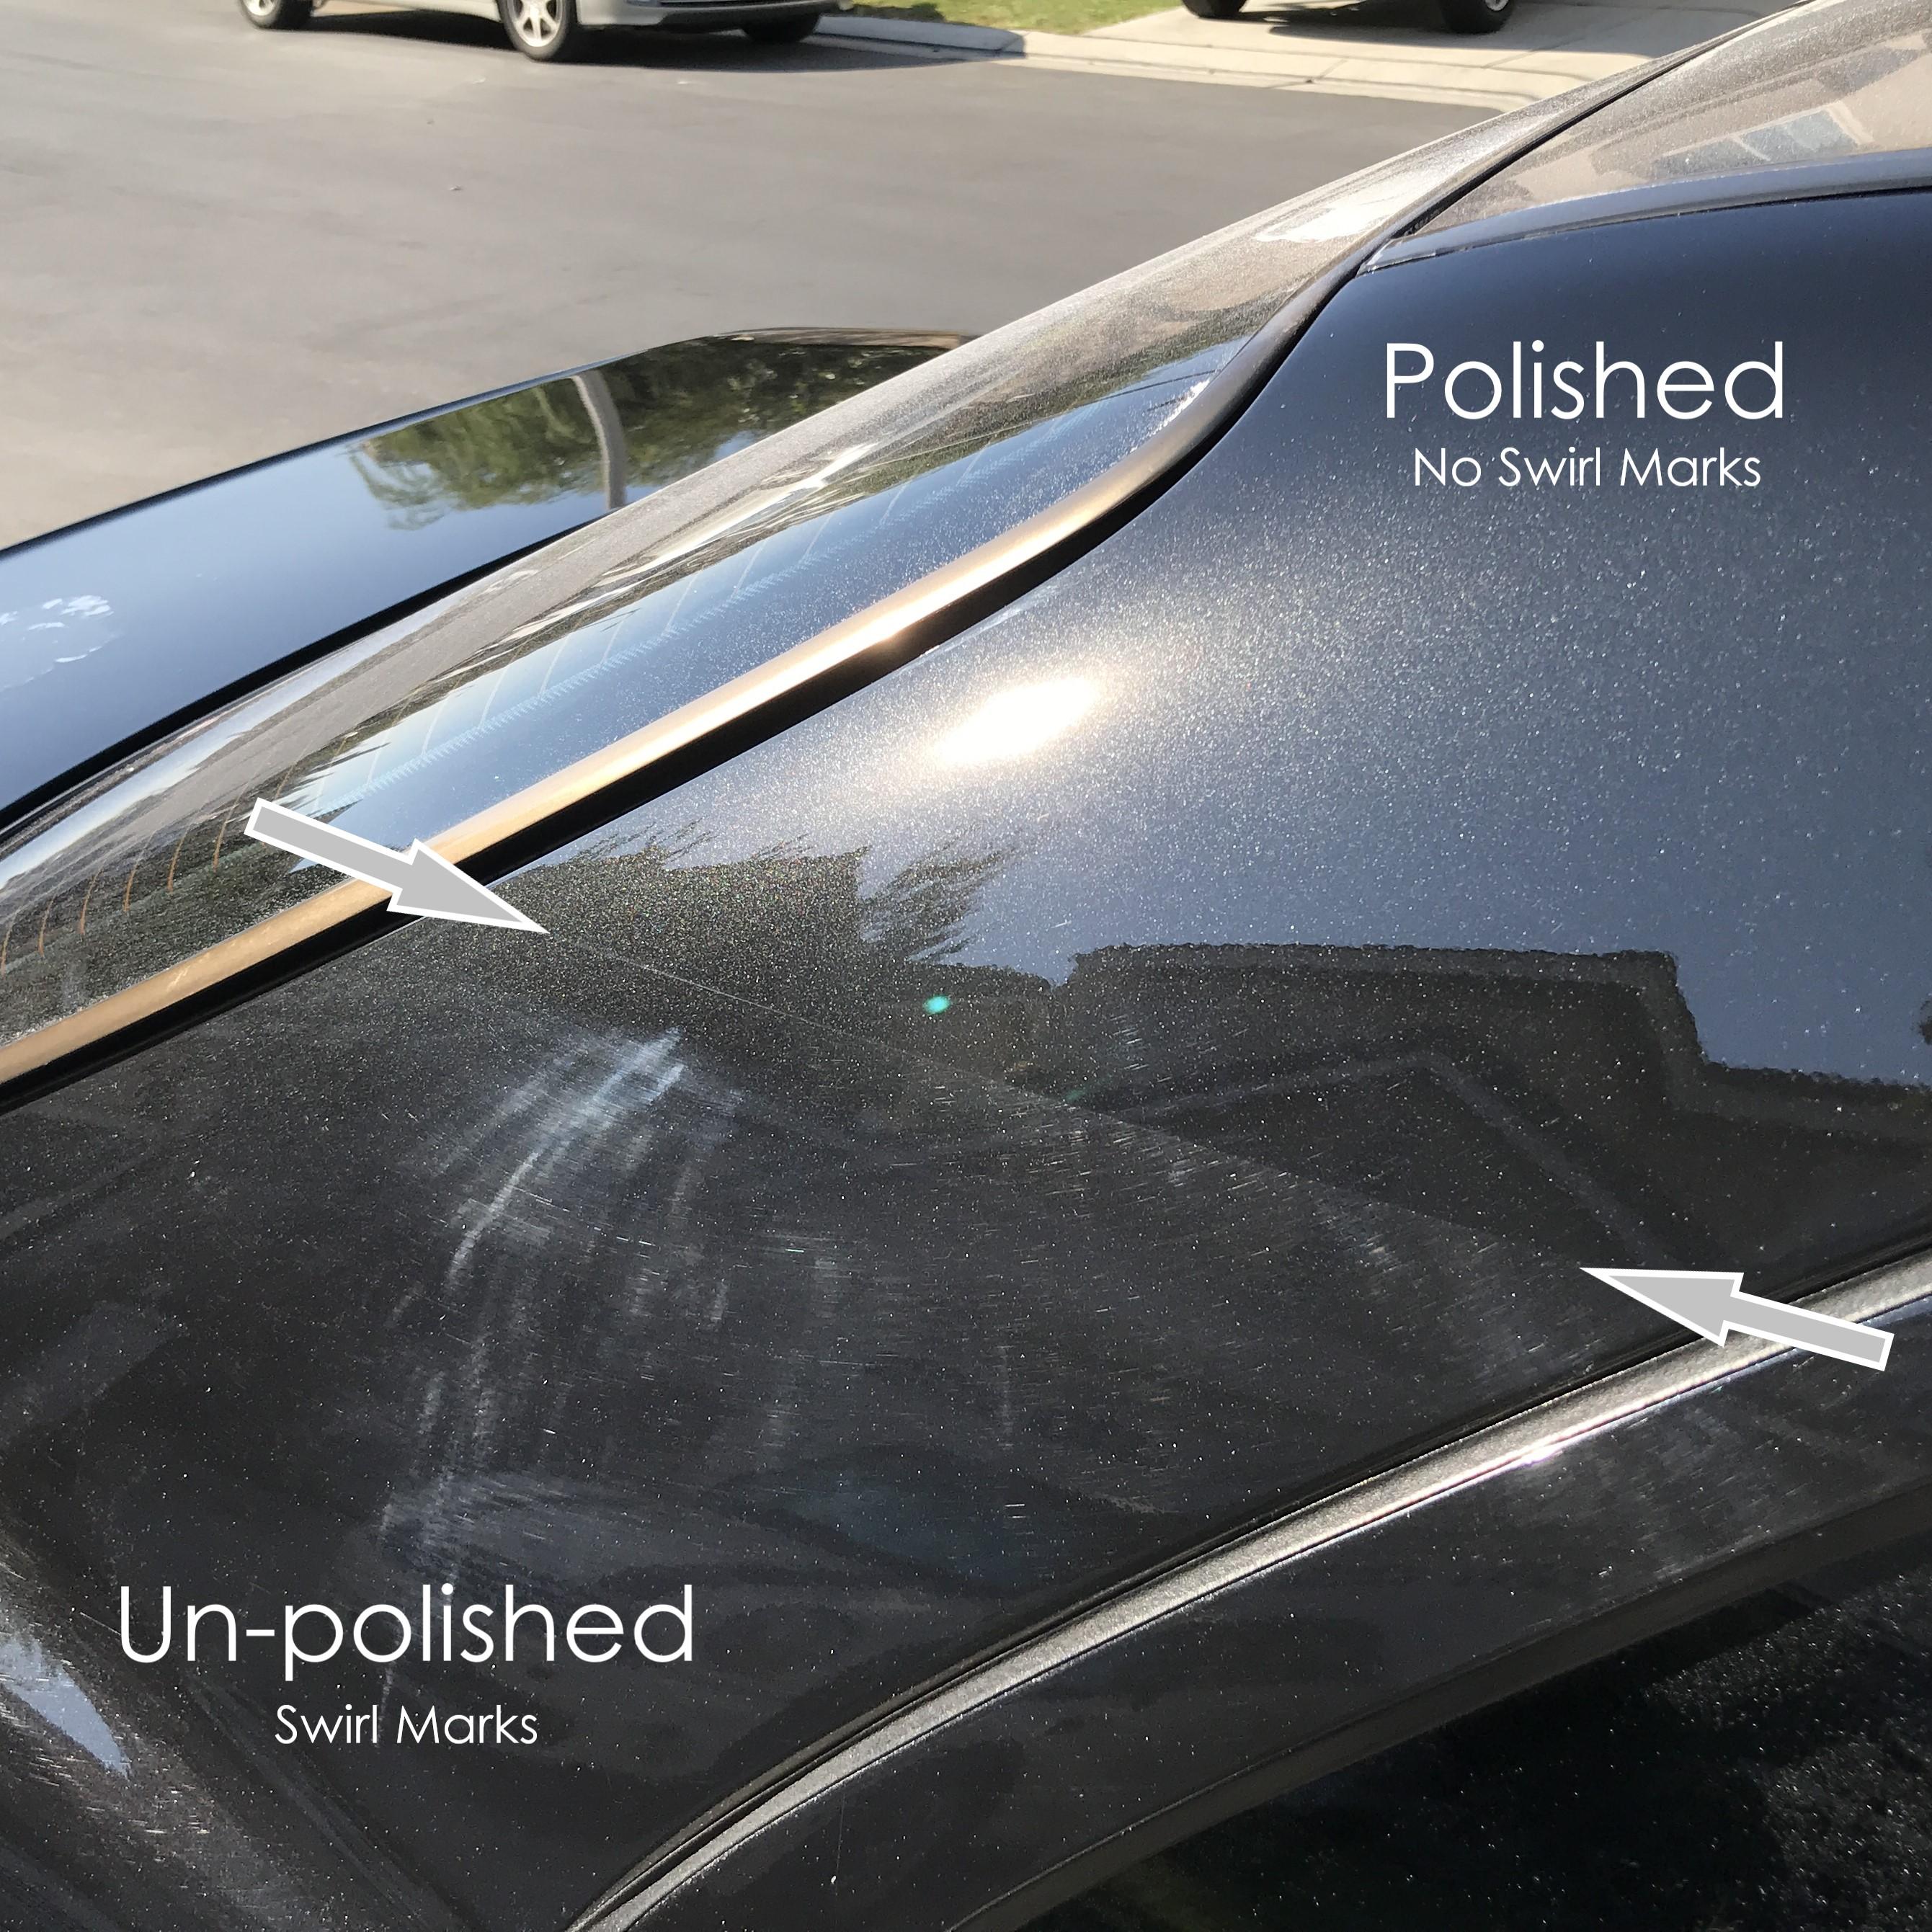 polish to remove swirl marks